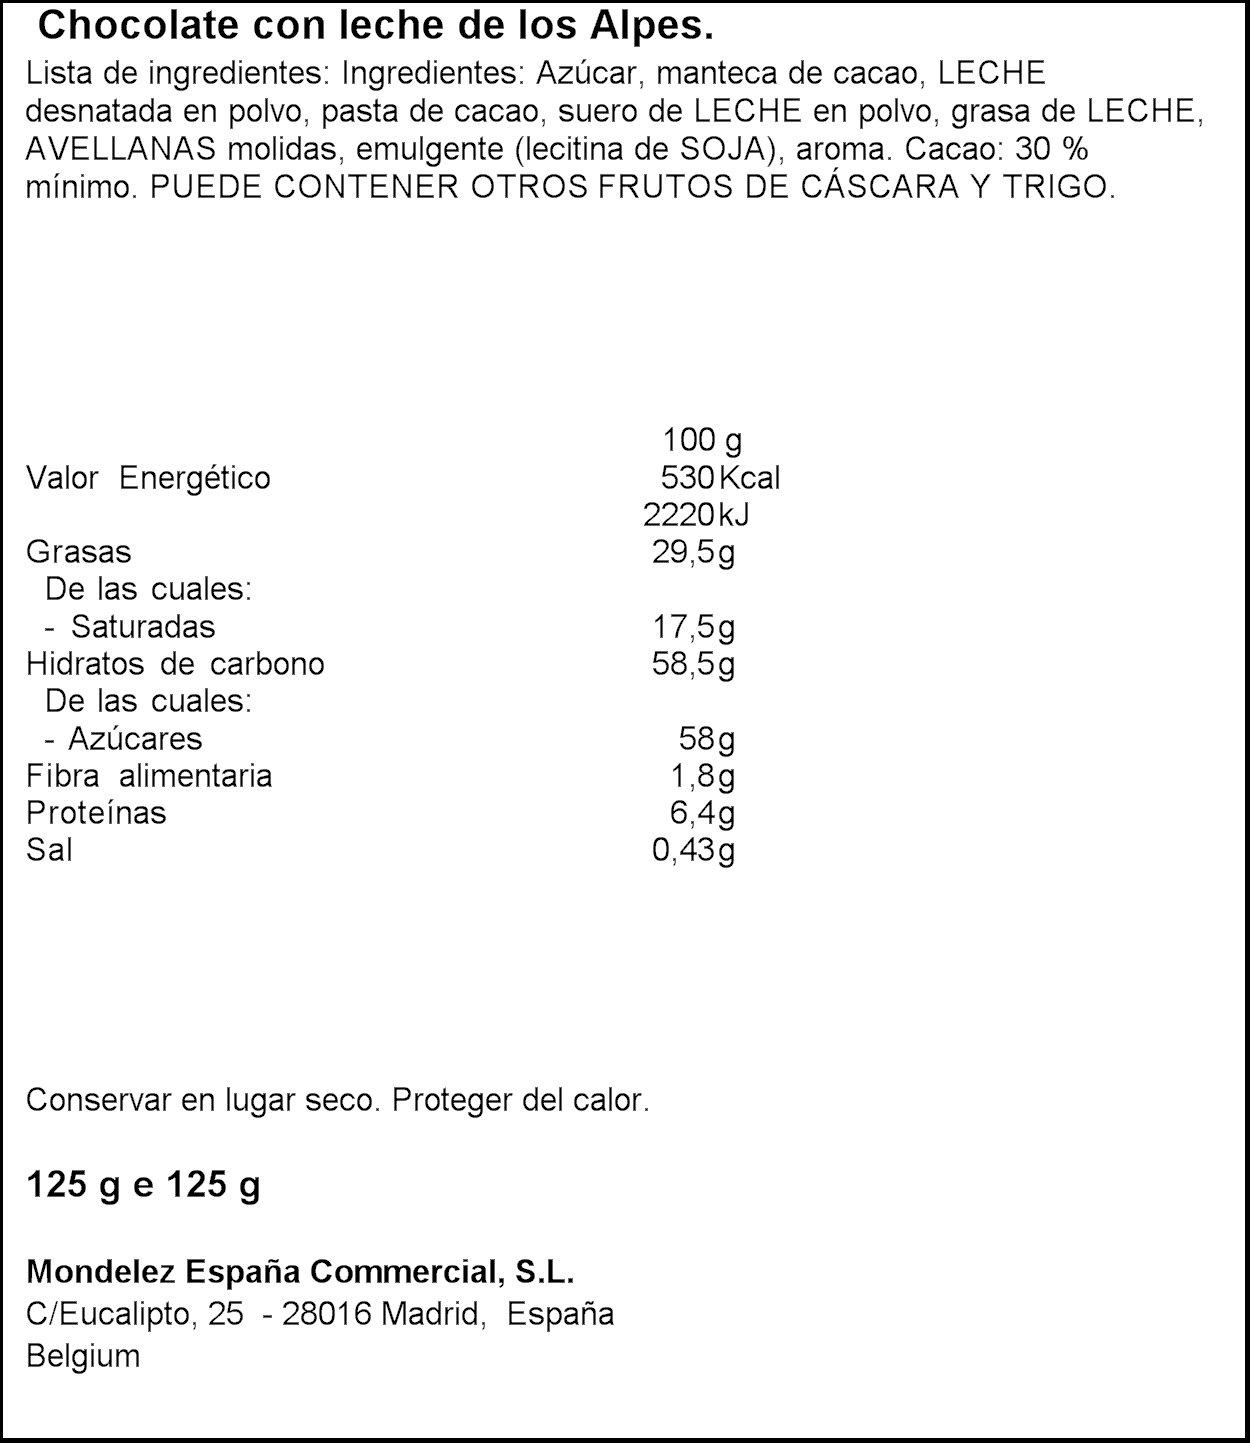 Milka - Tableta De Chocolate Leche - 125 g